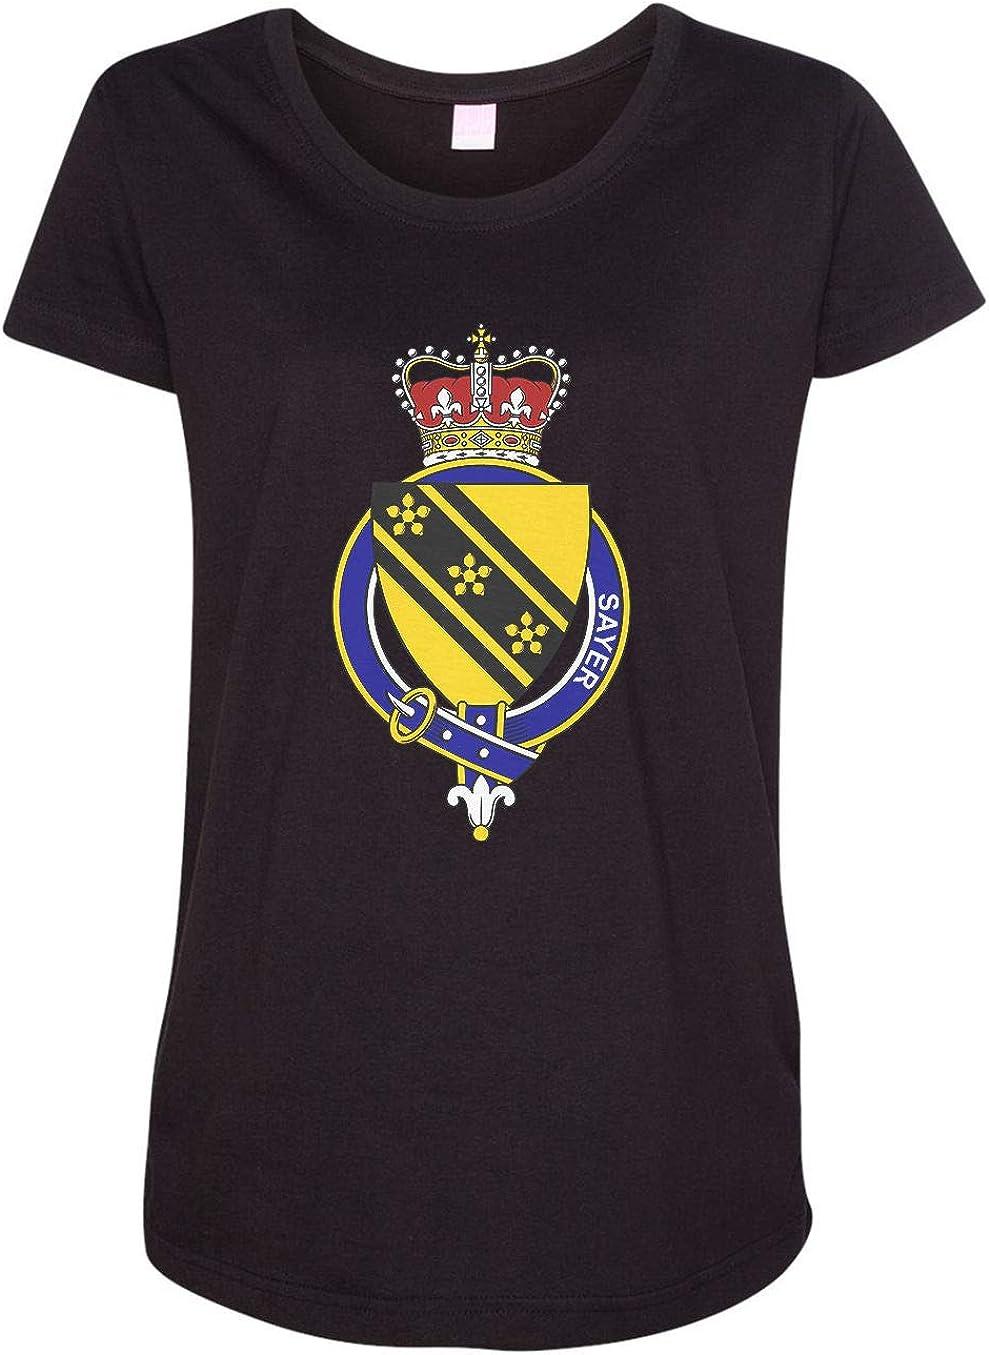 HARD EDGE DESIGN Women's English Garter Family Sayer T-Shirt